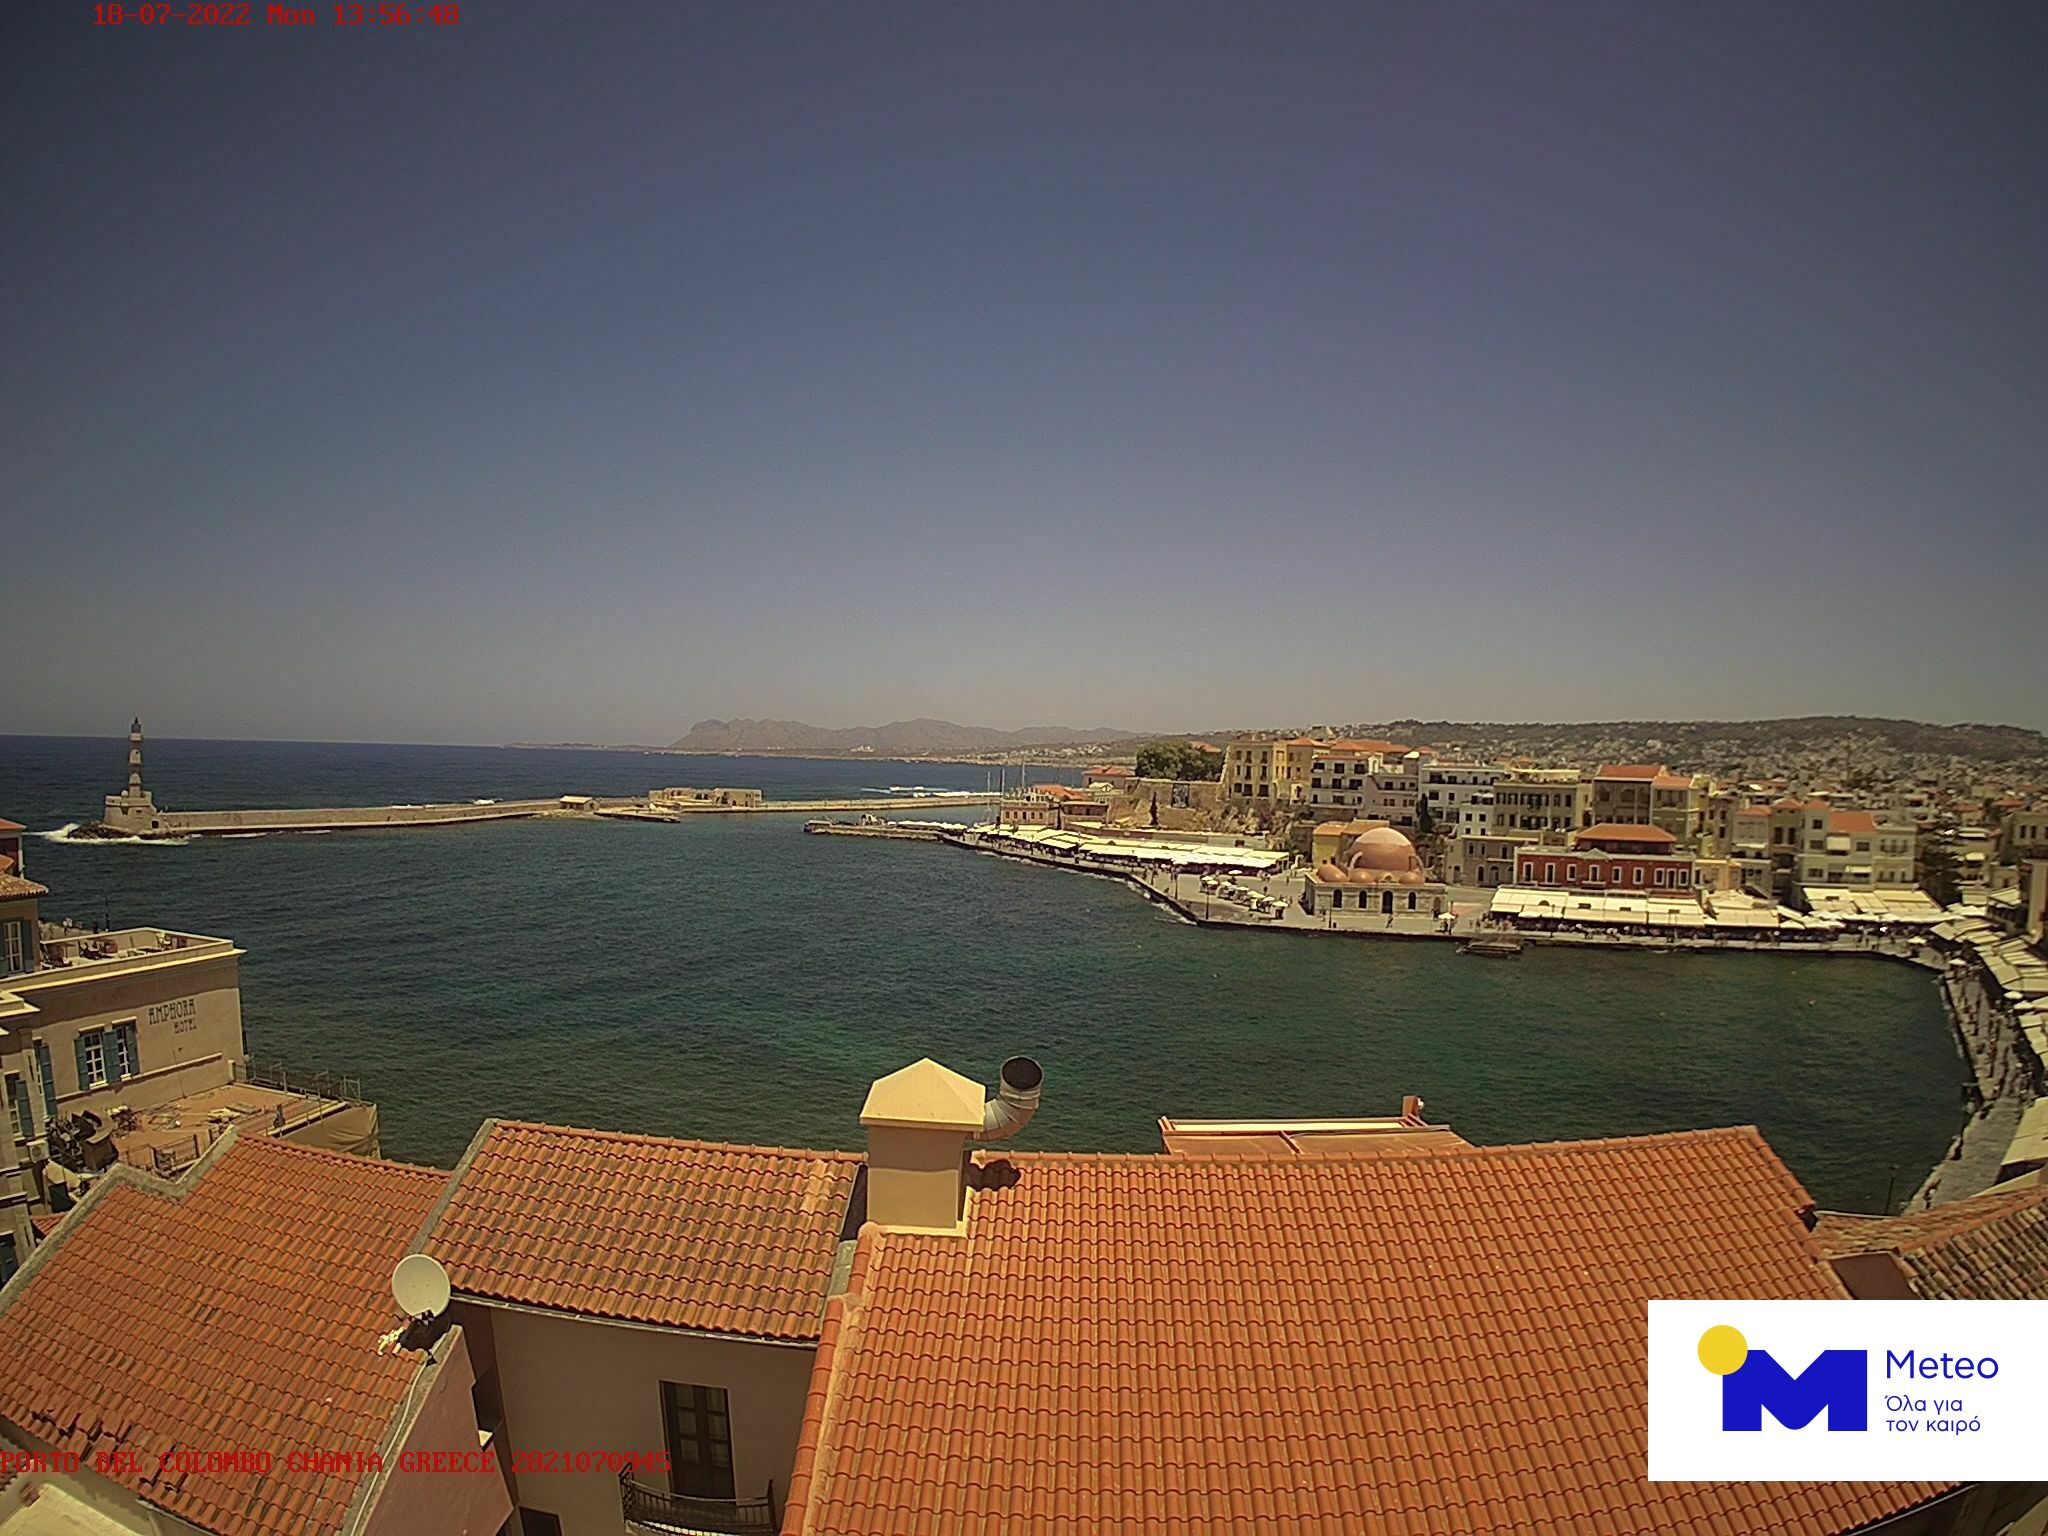 Webcam In Crete 30